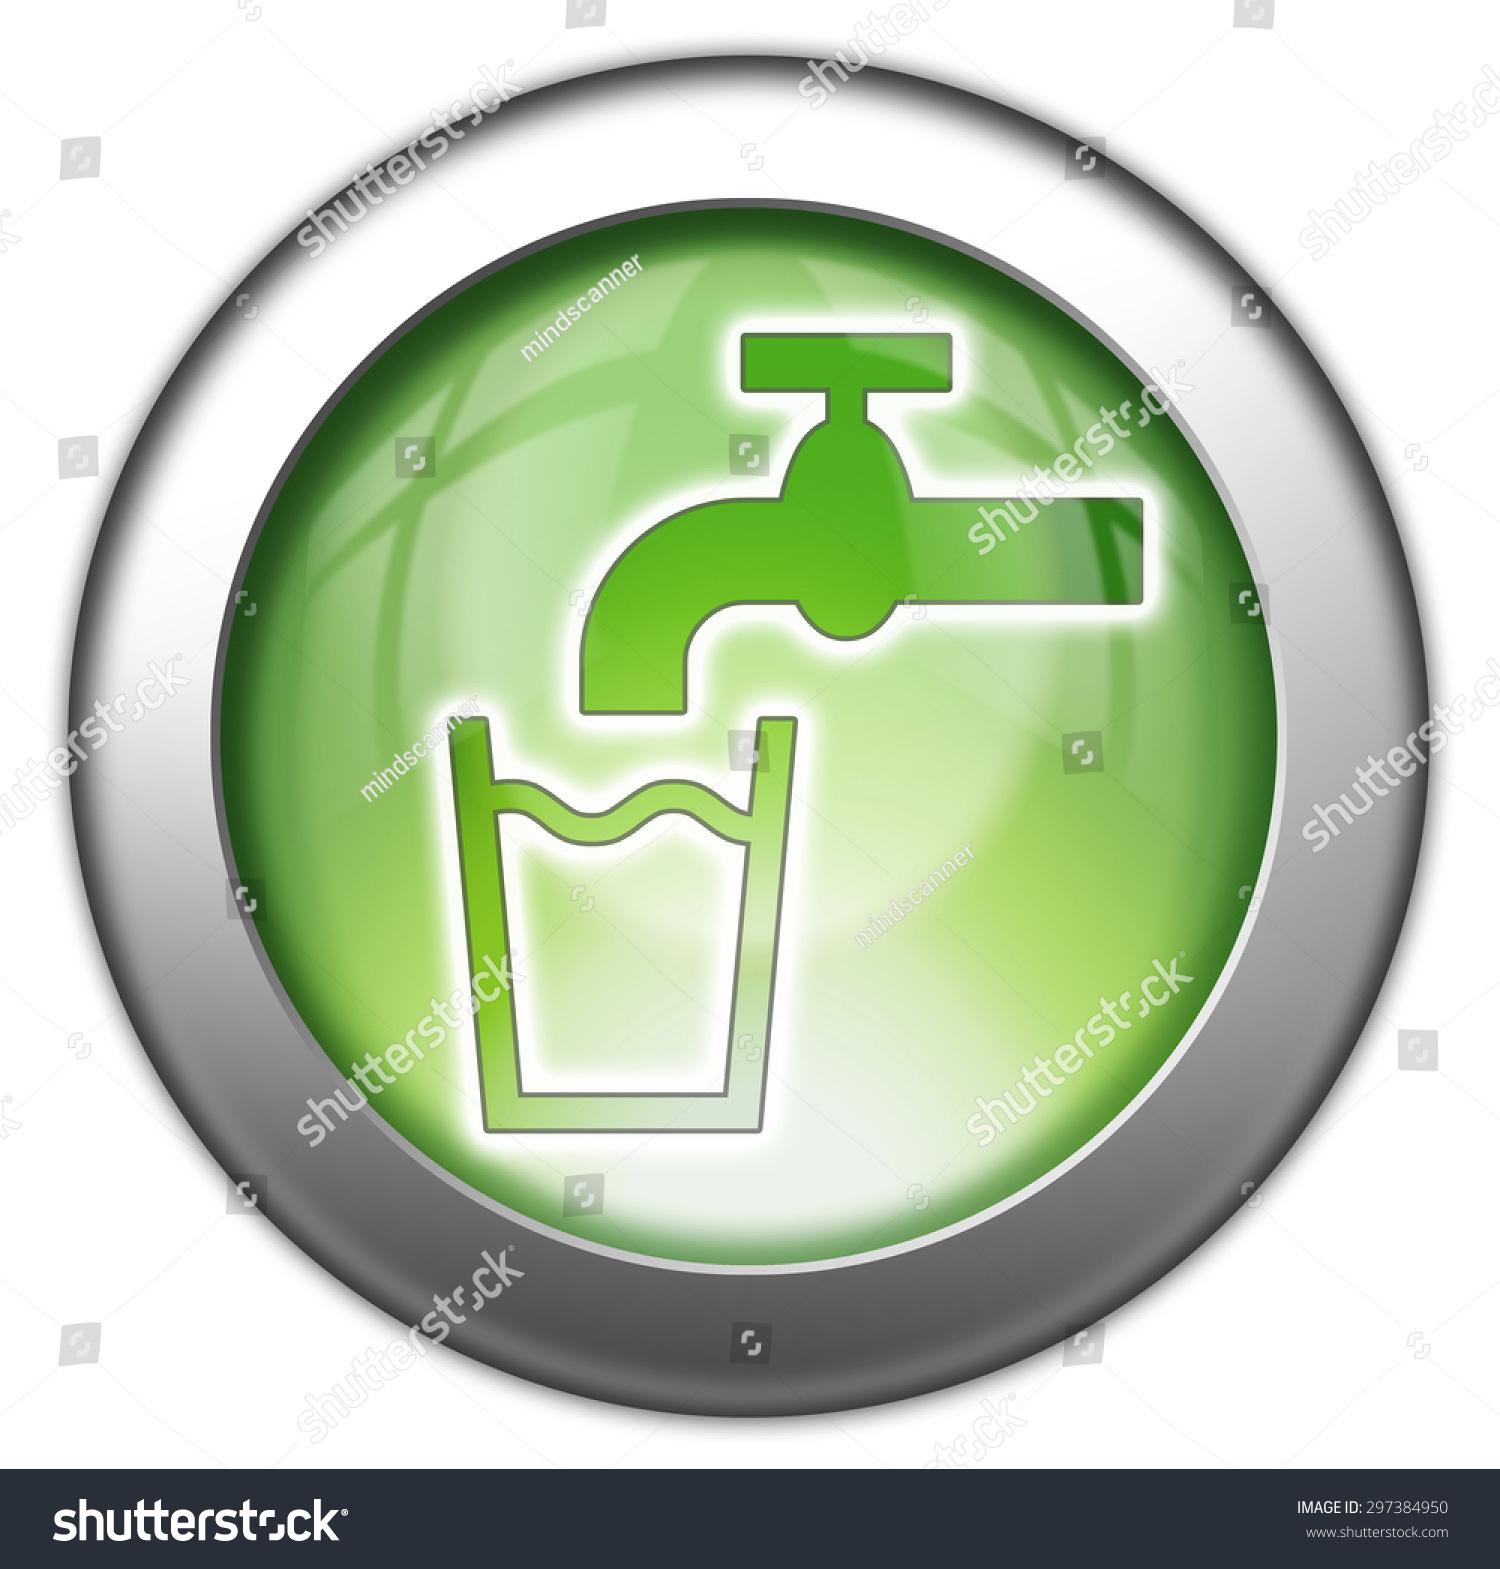 Icon Button Pictogram Running Water Symbol Stock Illustration